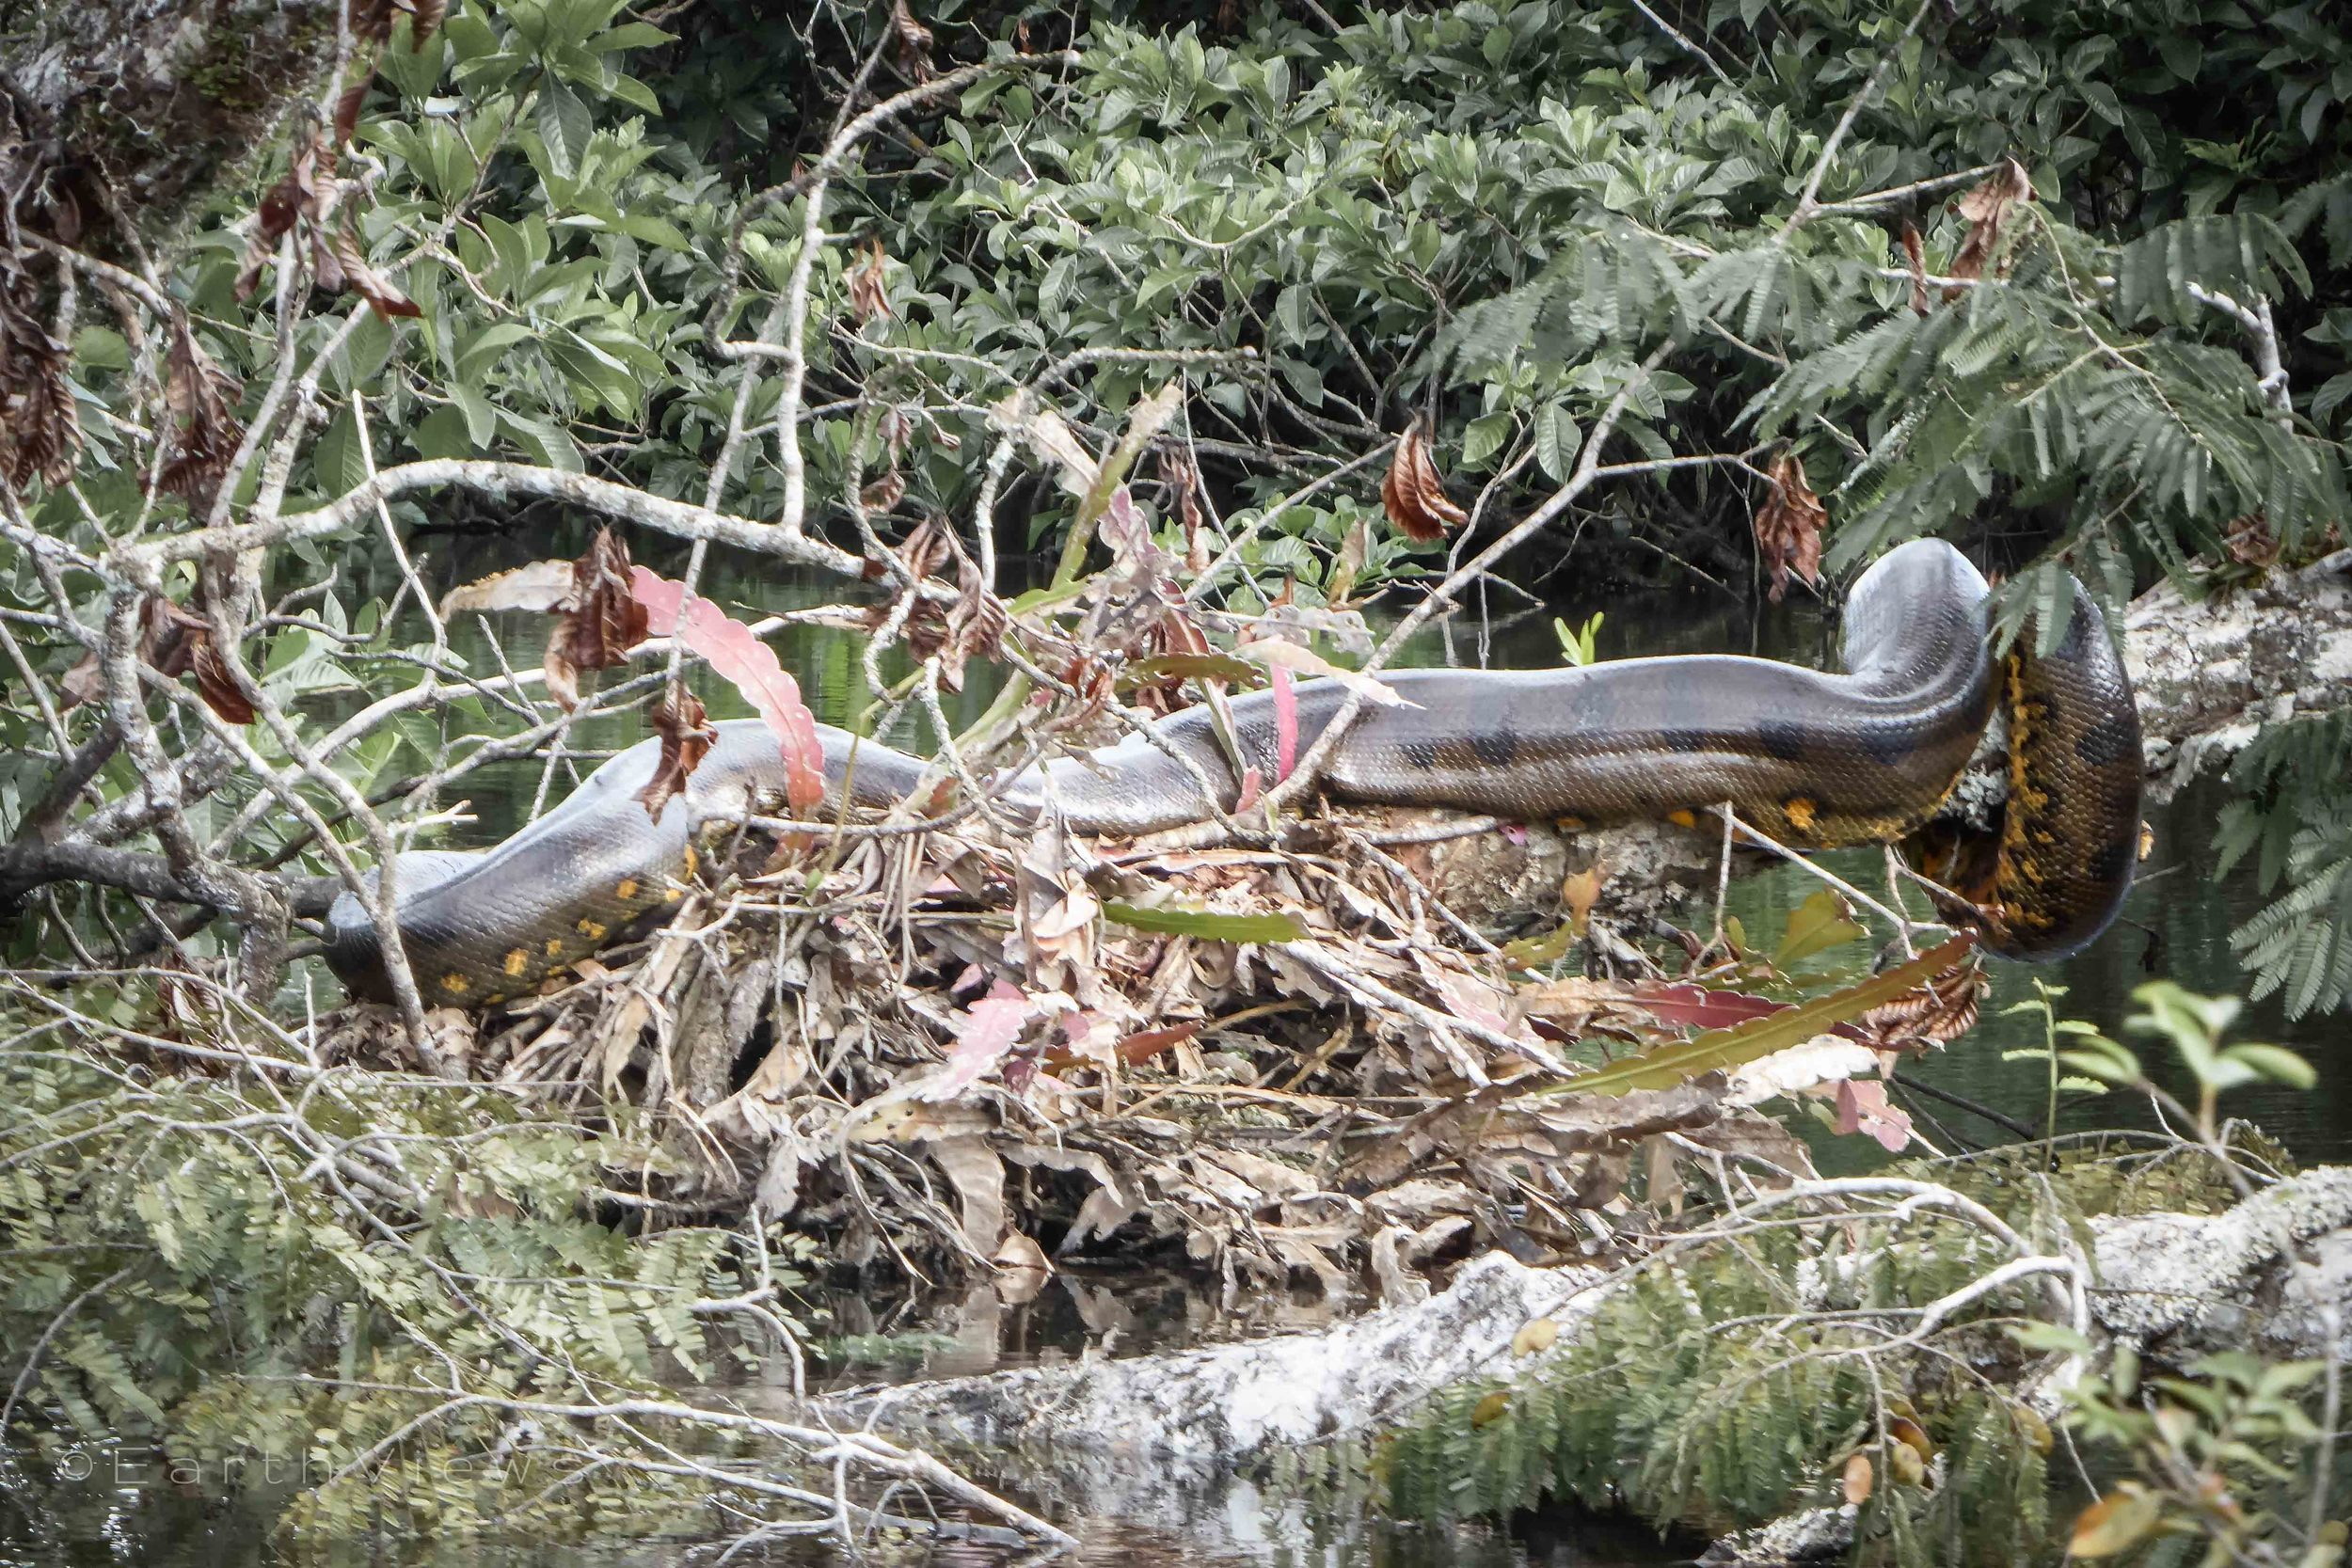 An anaconda twirled around a macrolobium tree standing in the water.